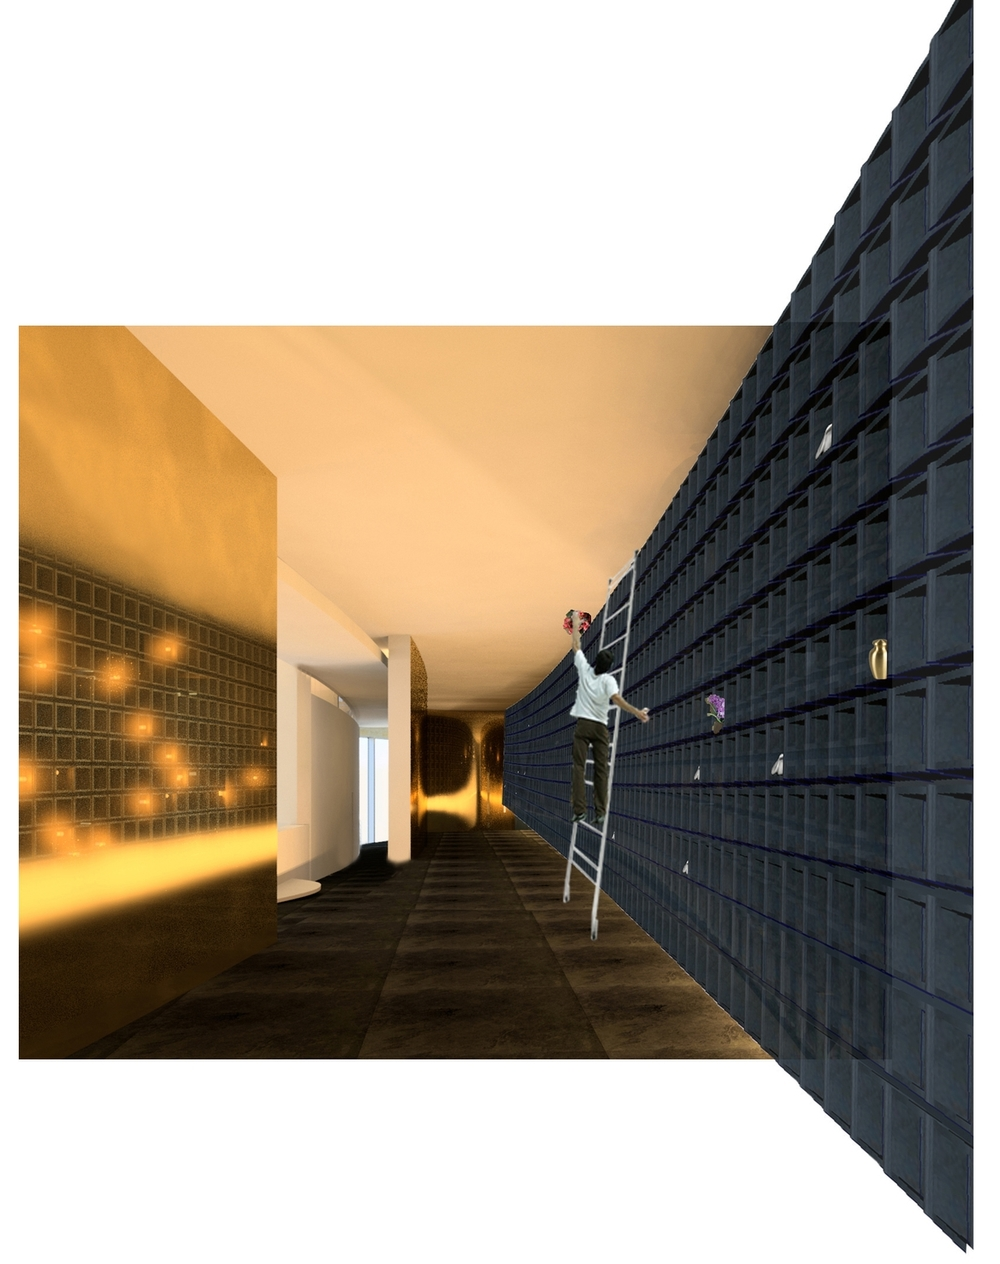 perspectivefinal12.jpg